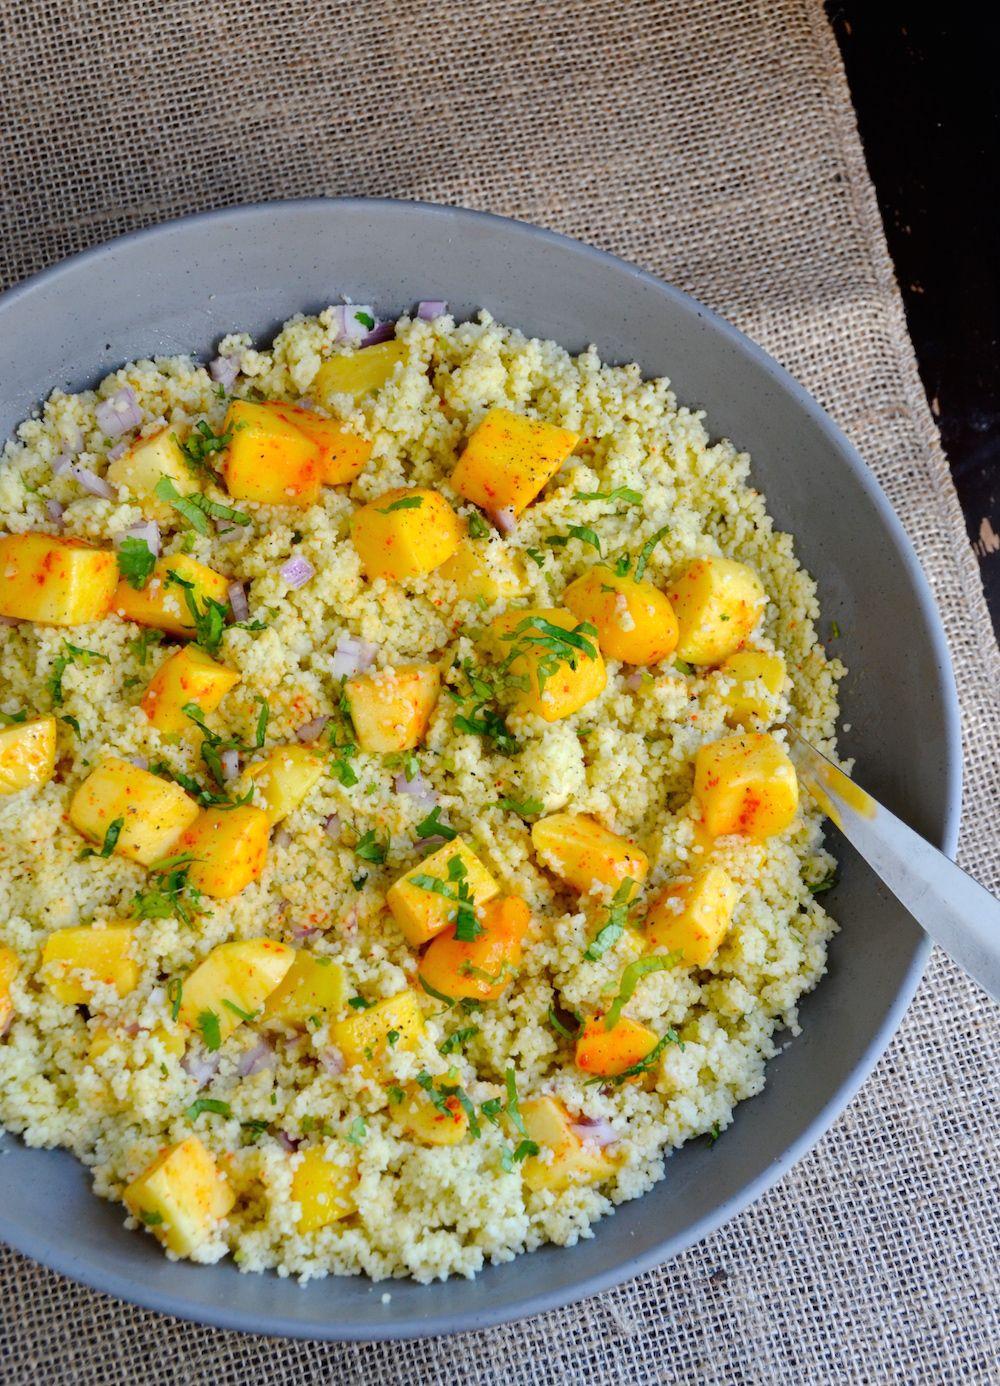 Coconut Mango Couscous Salad (+ Ideas for a Tropical Fall Party Menu!)